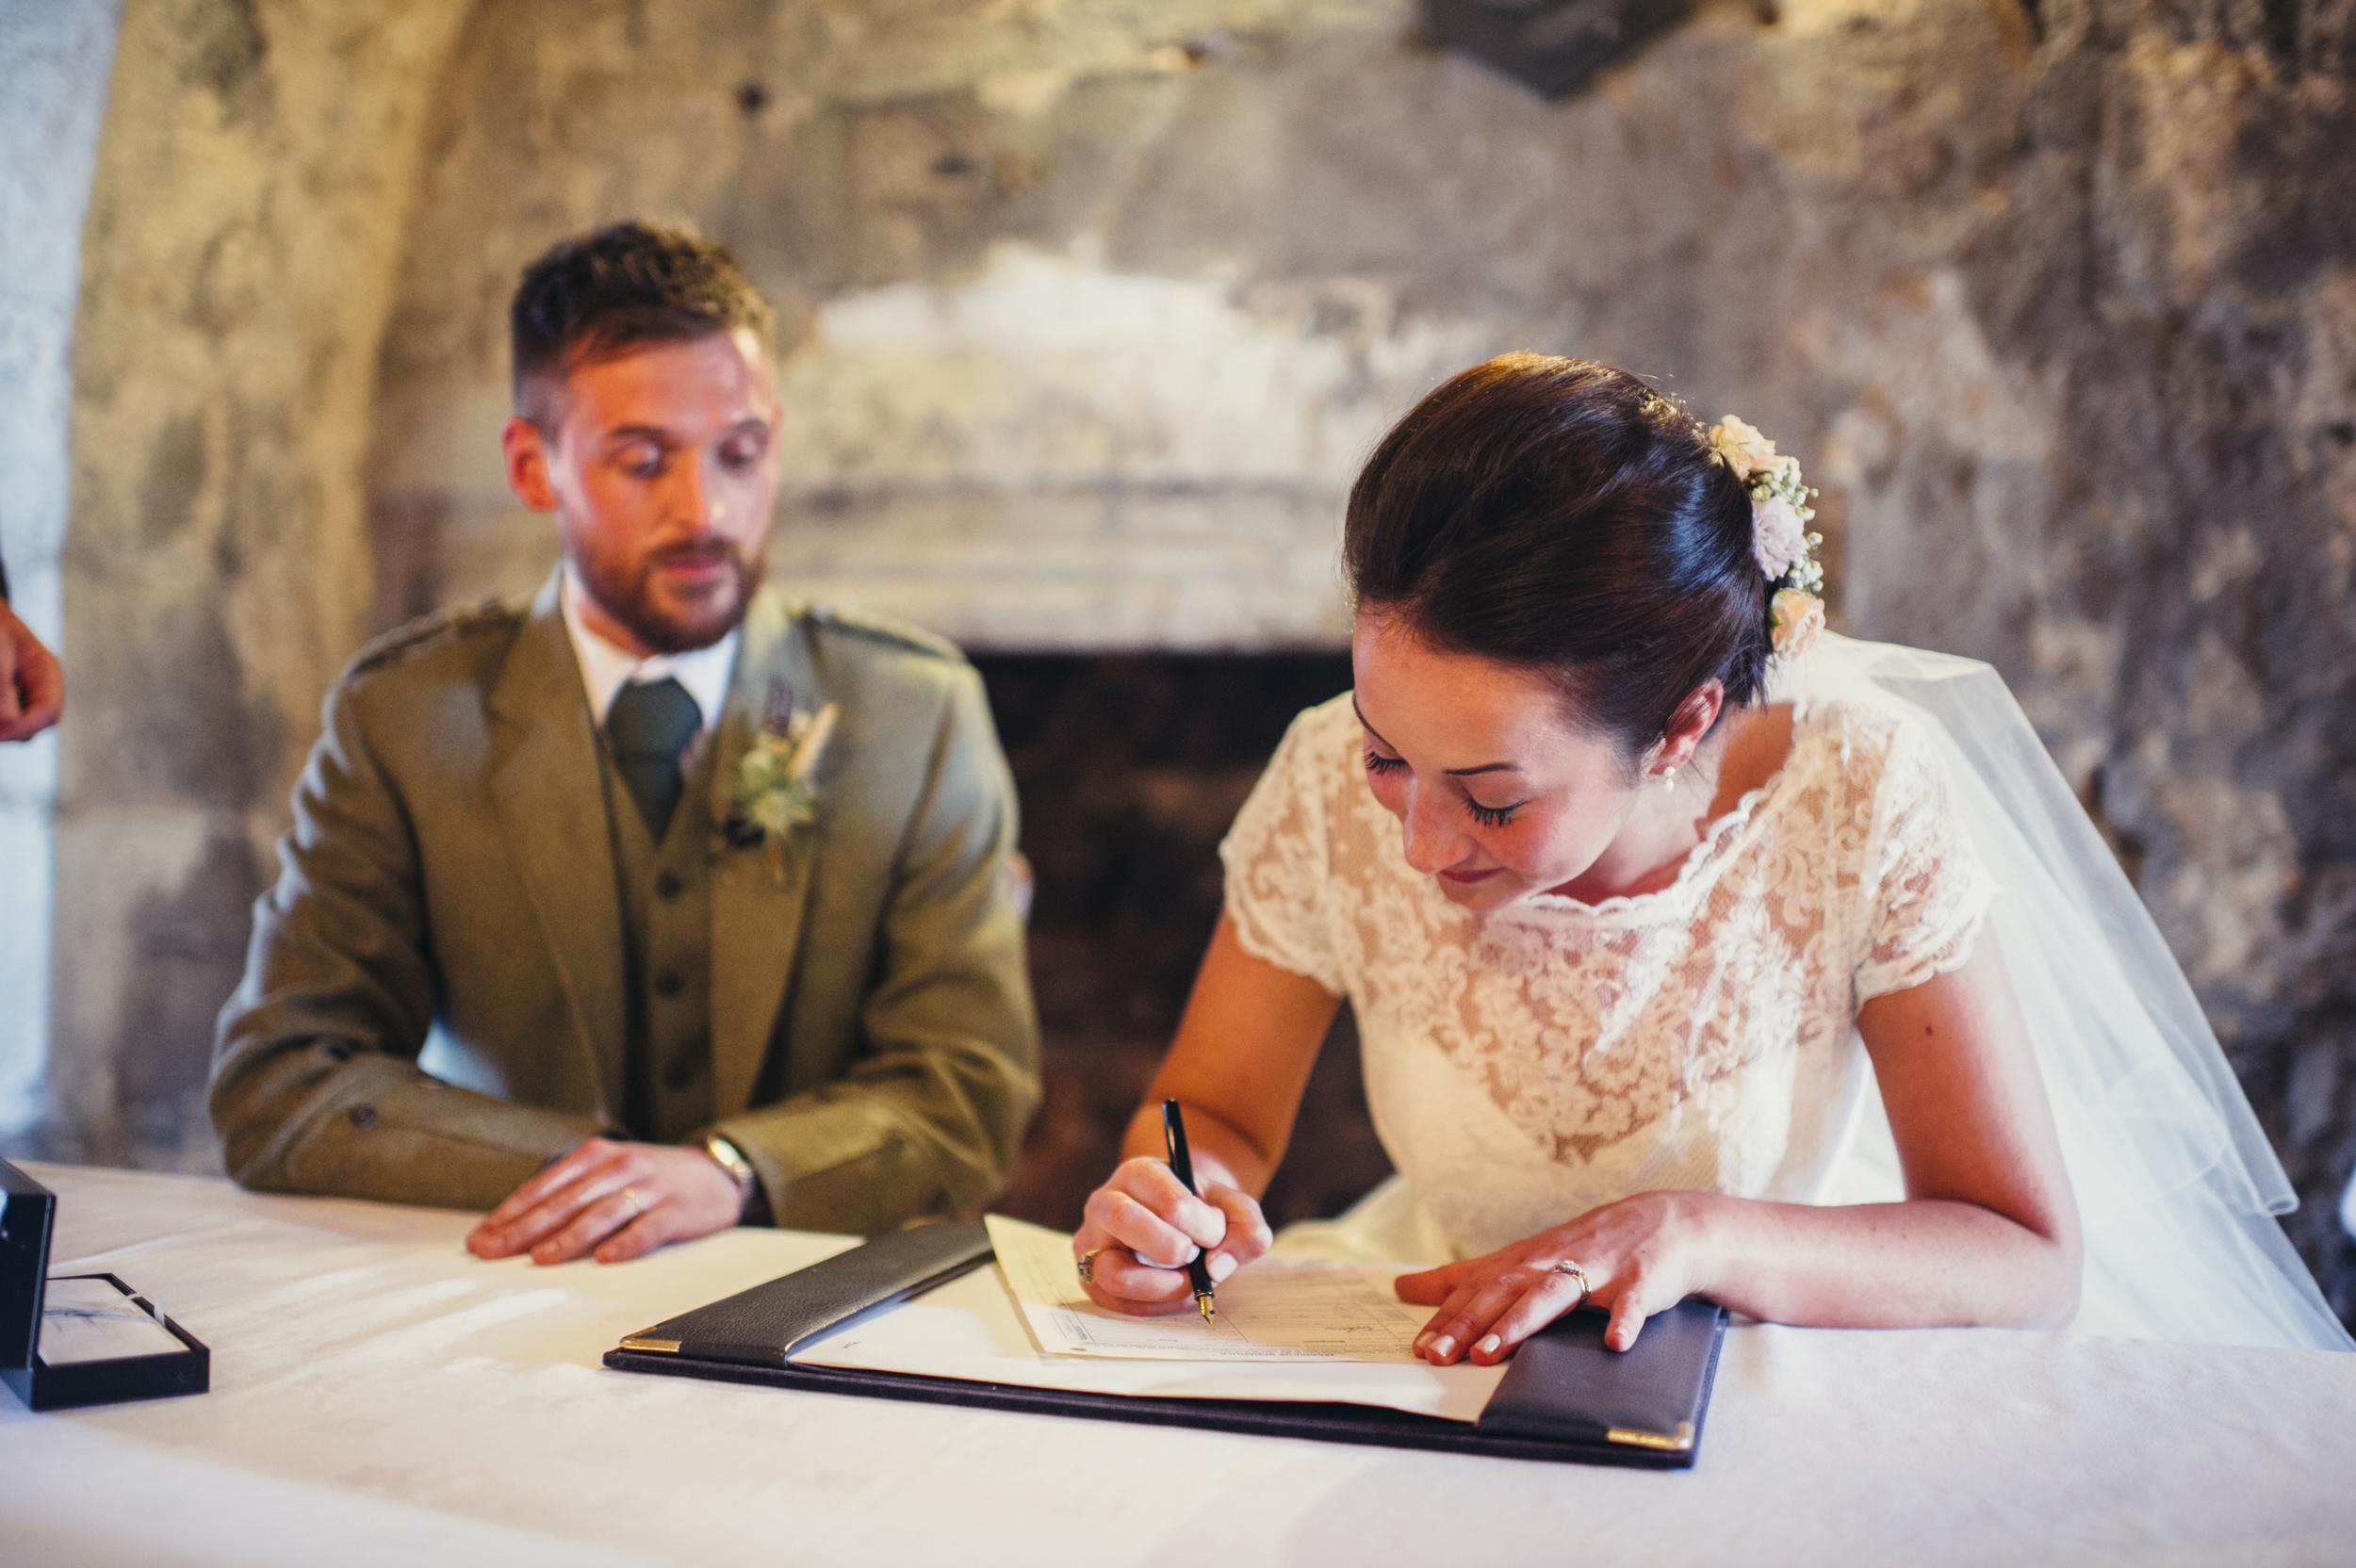 0109-lisa-devine-alternative-creative-wedding-photography-glasgow-edinburgh.JPG